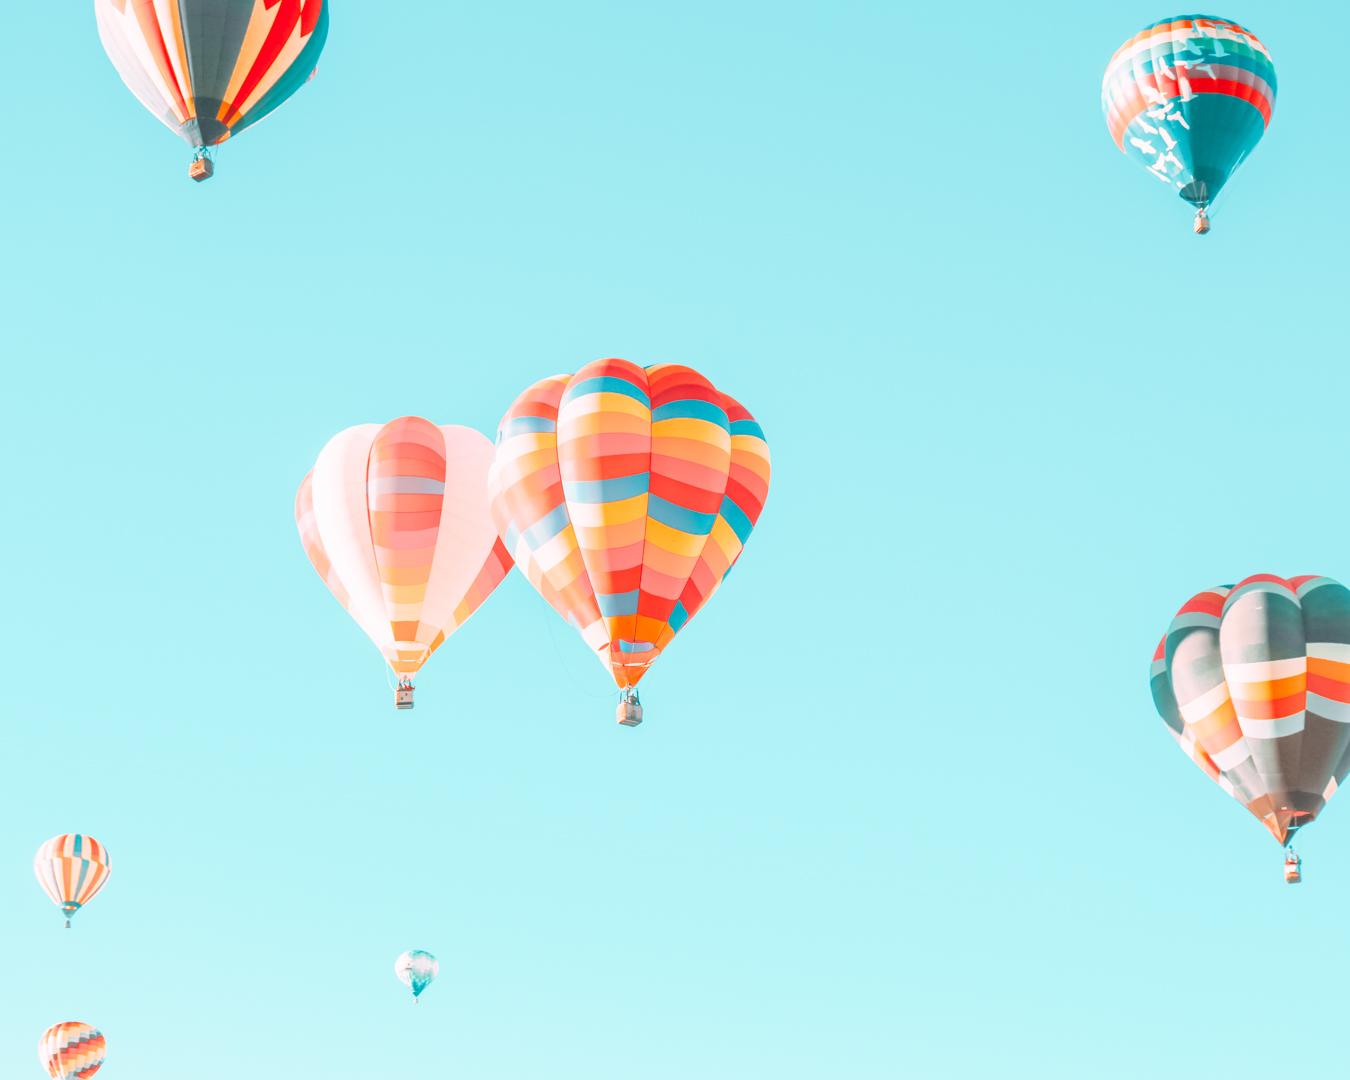 Instagrammable balloons at the Albuquerque International Balloon Fiesta